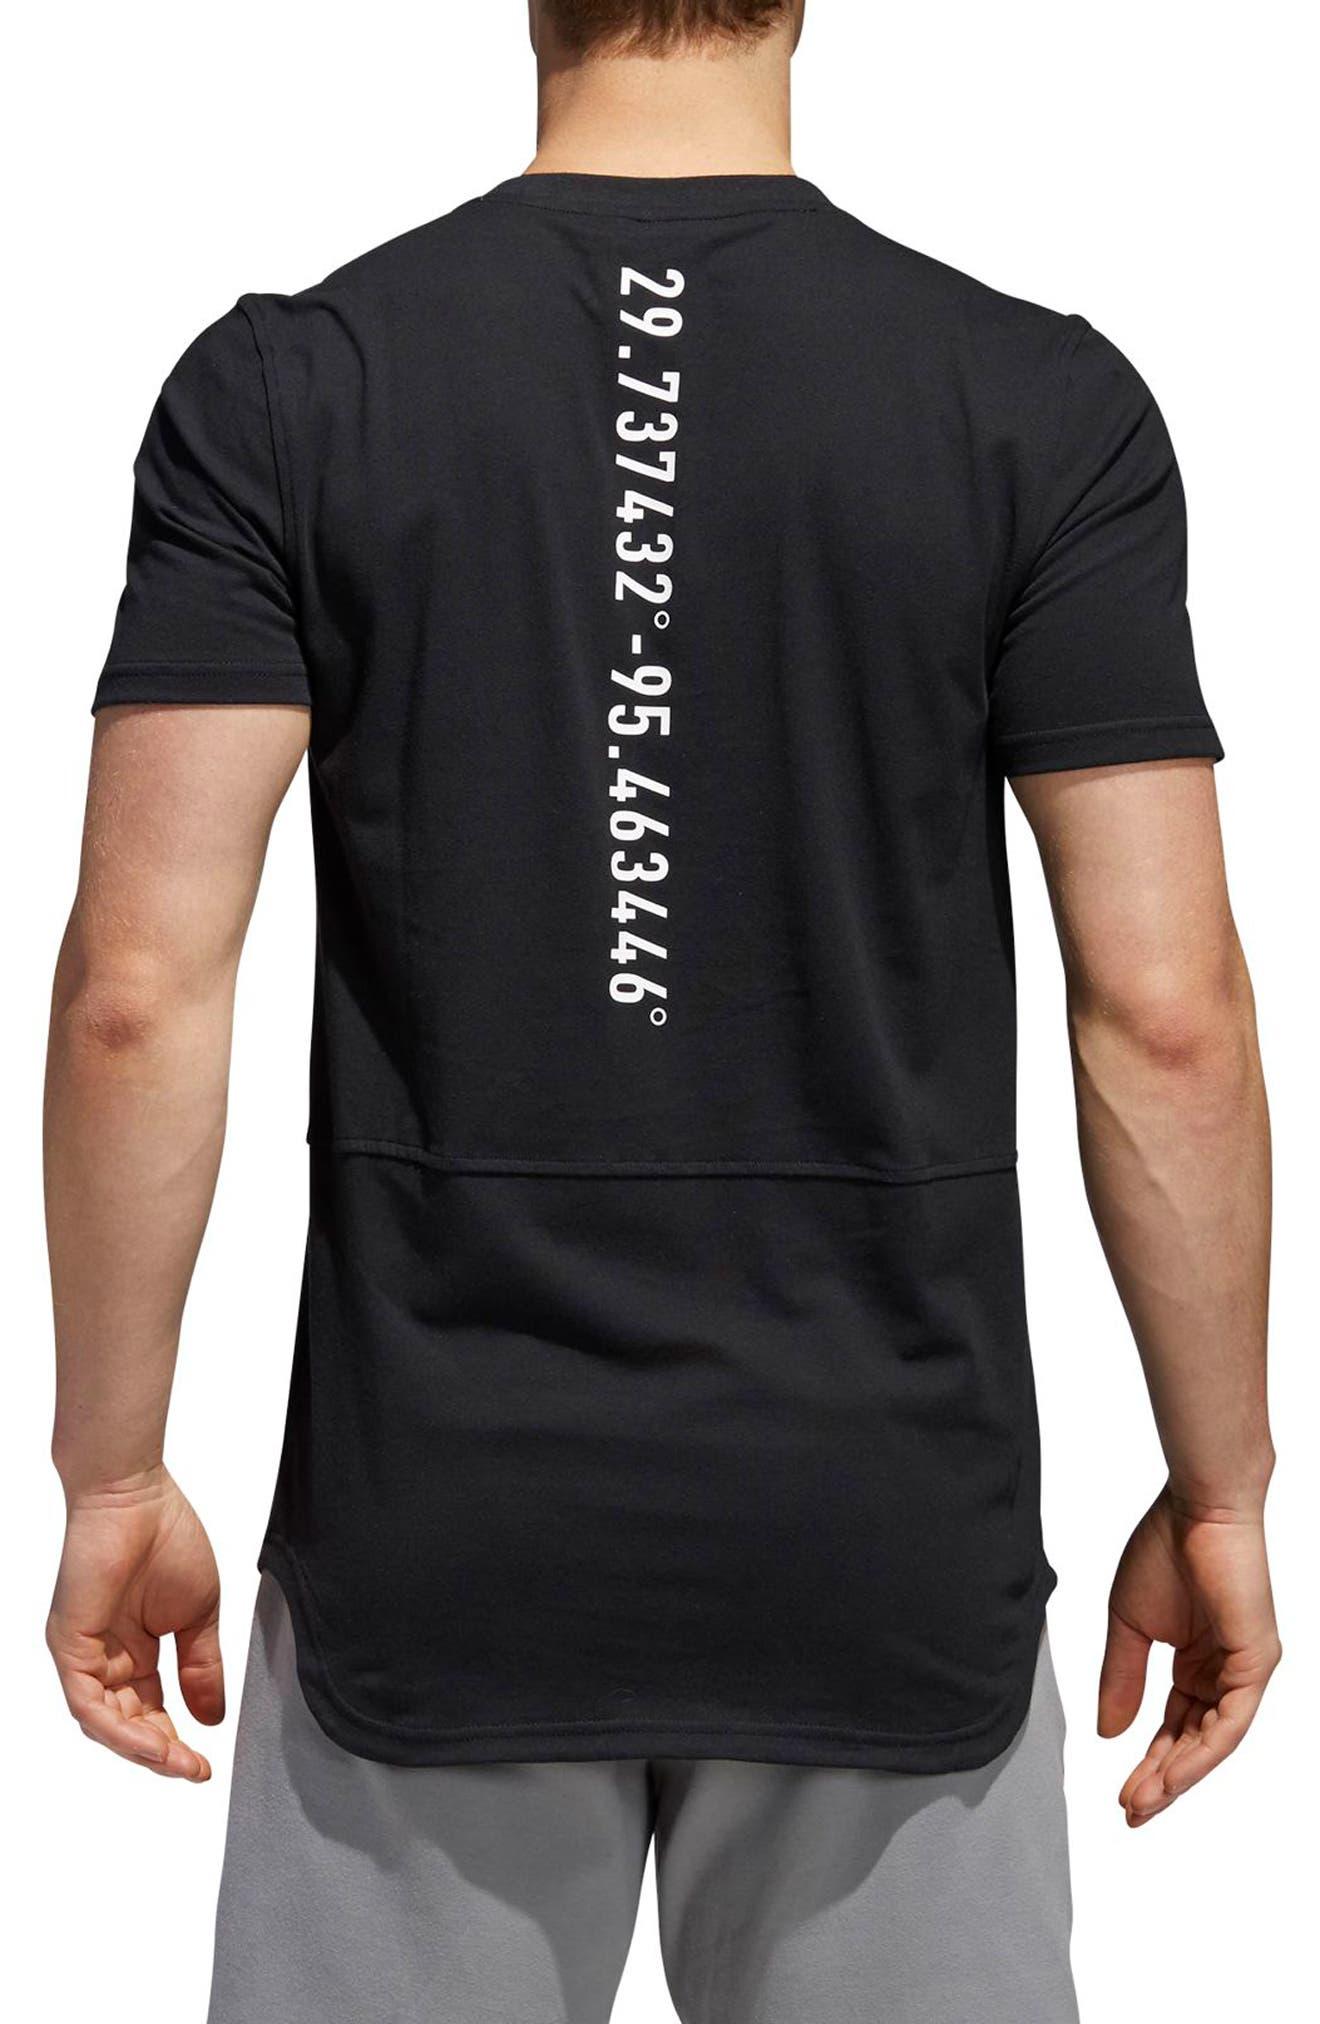 Elevate HOU T-Shirt,                             Alternate thumbnail 2, color,                             Black / White